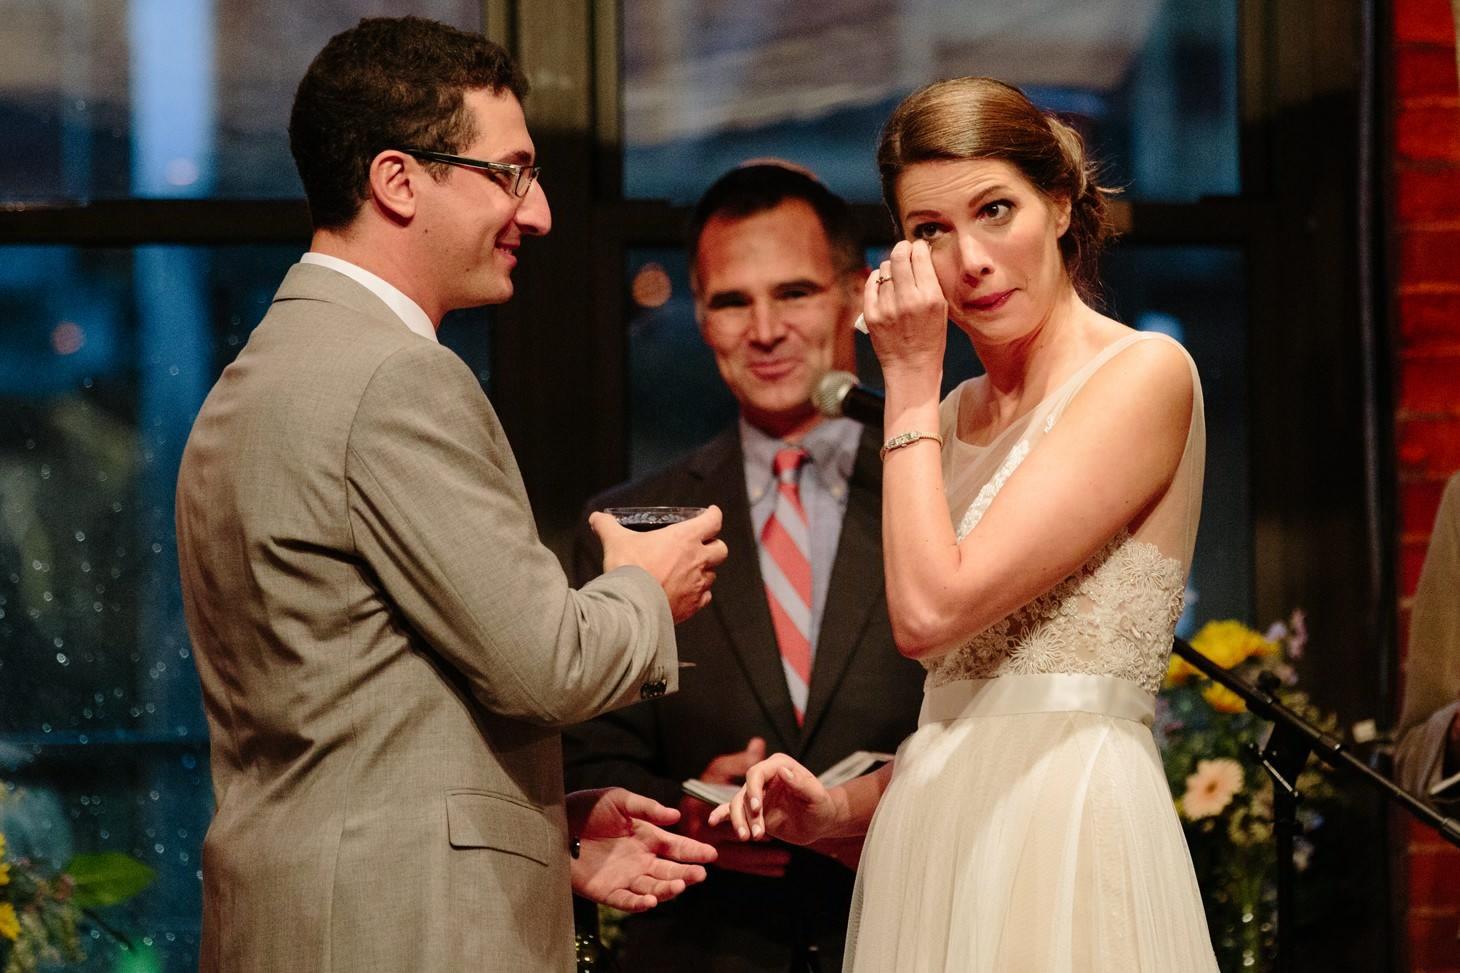 028-nyc-dumbo-loft-brooklyn-wedding-photographer-smitten-chickens-photo-.jpg